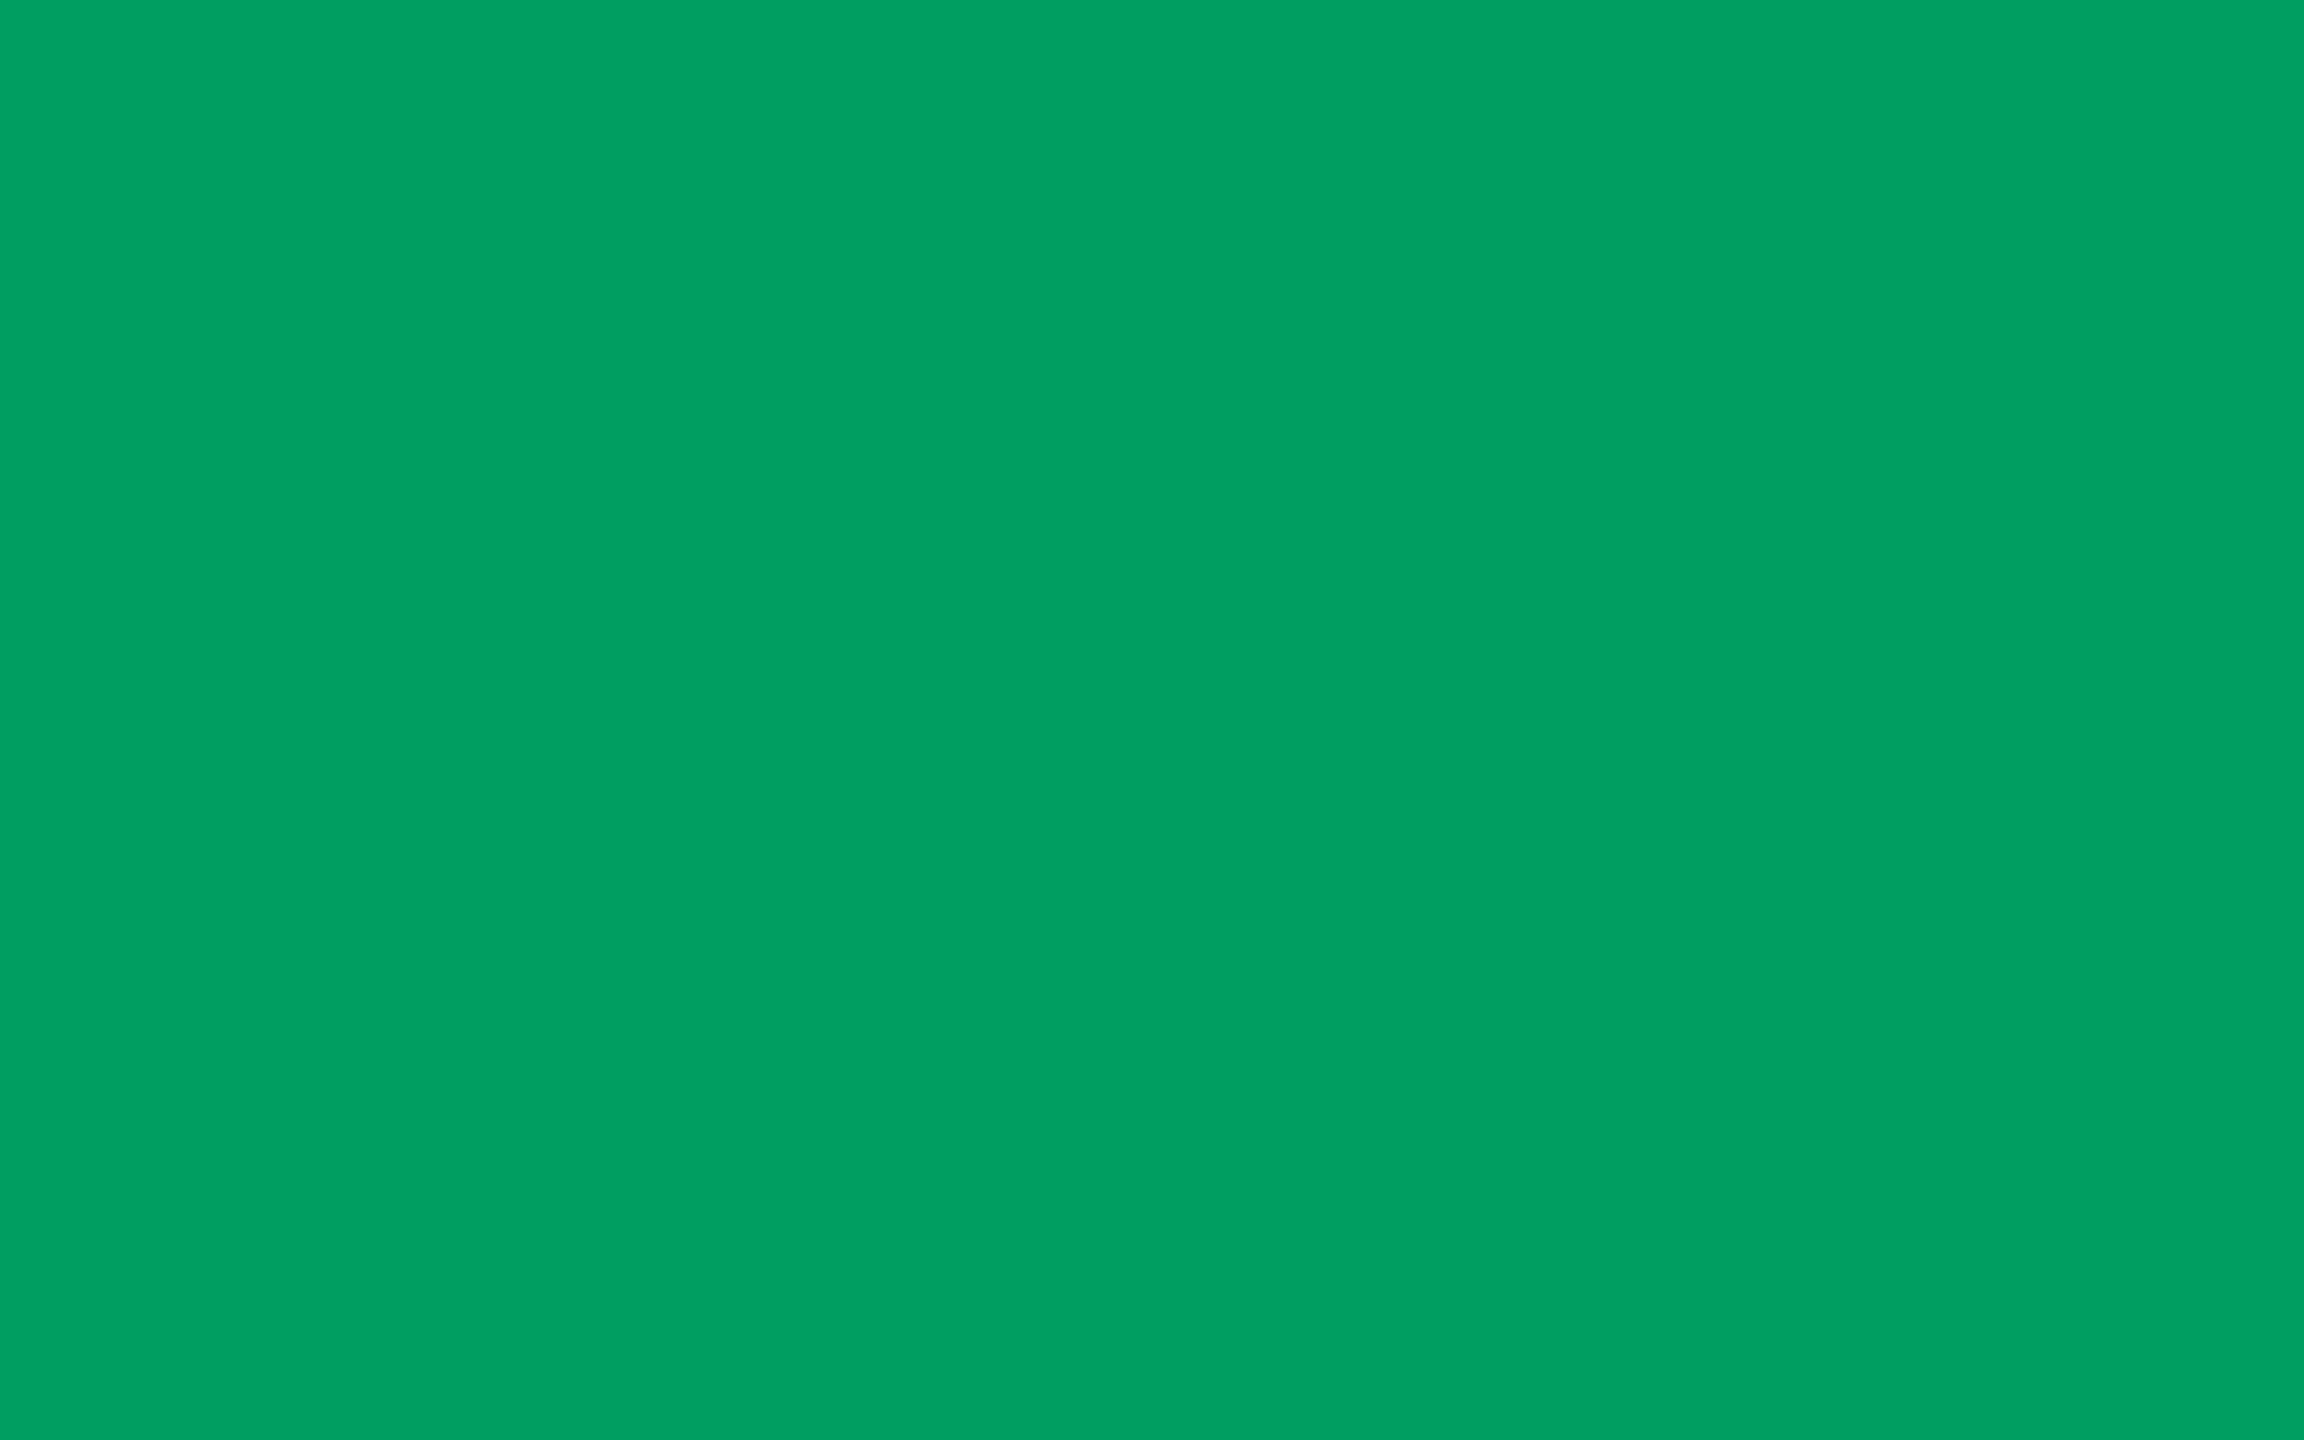 2304x1440 Shamrock Green Solid Color Background